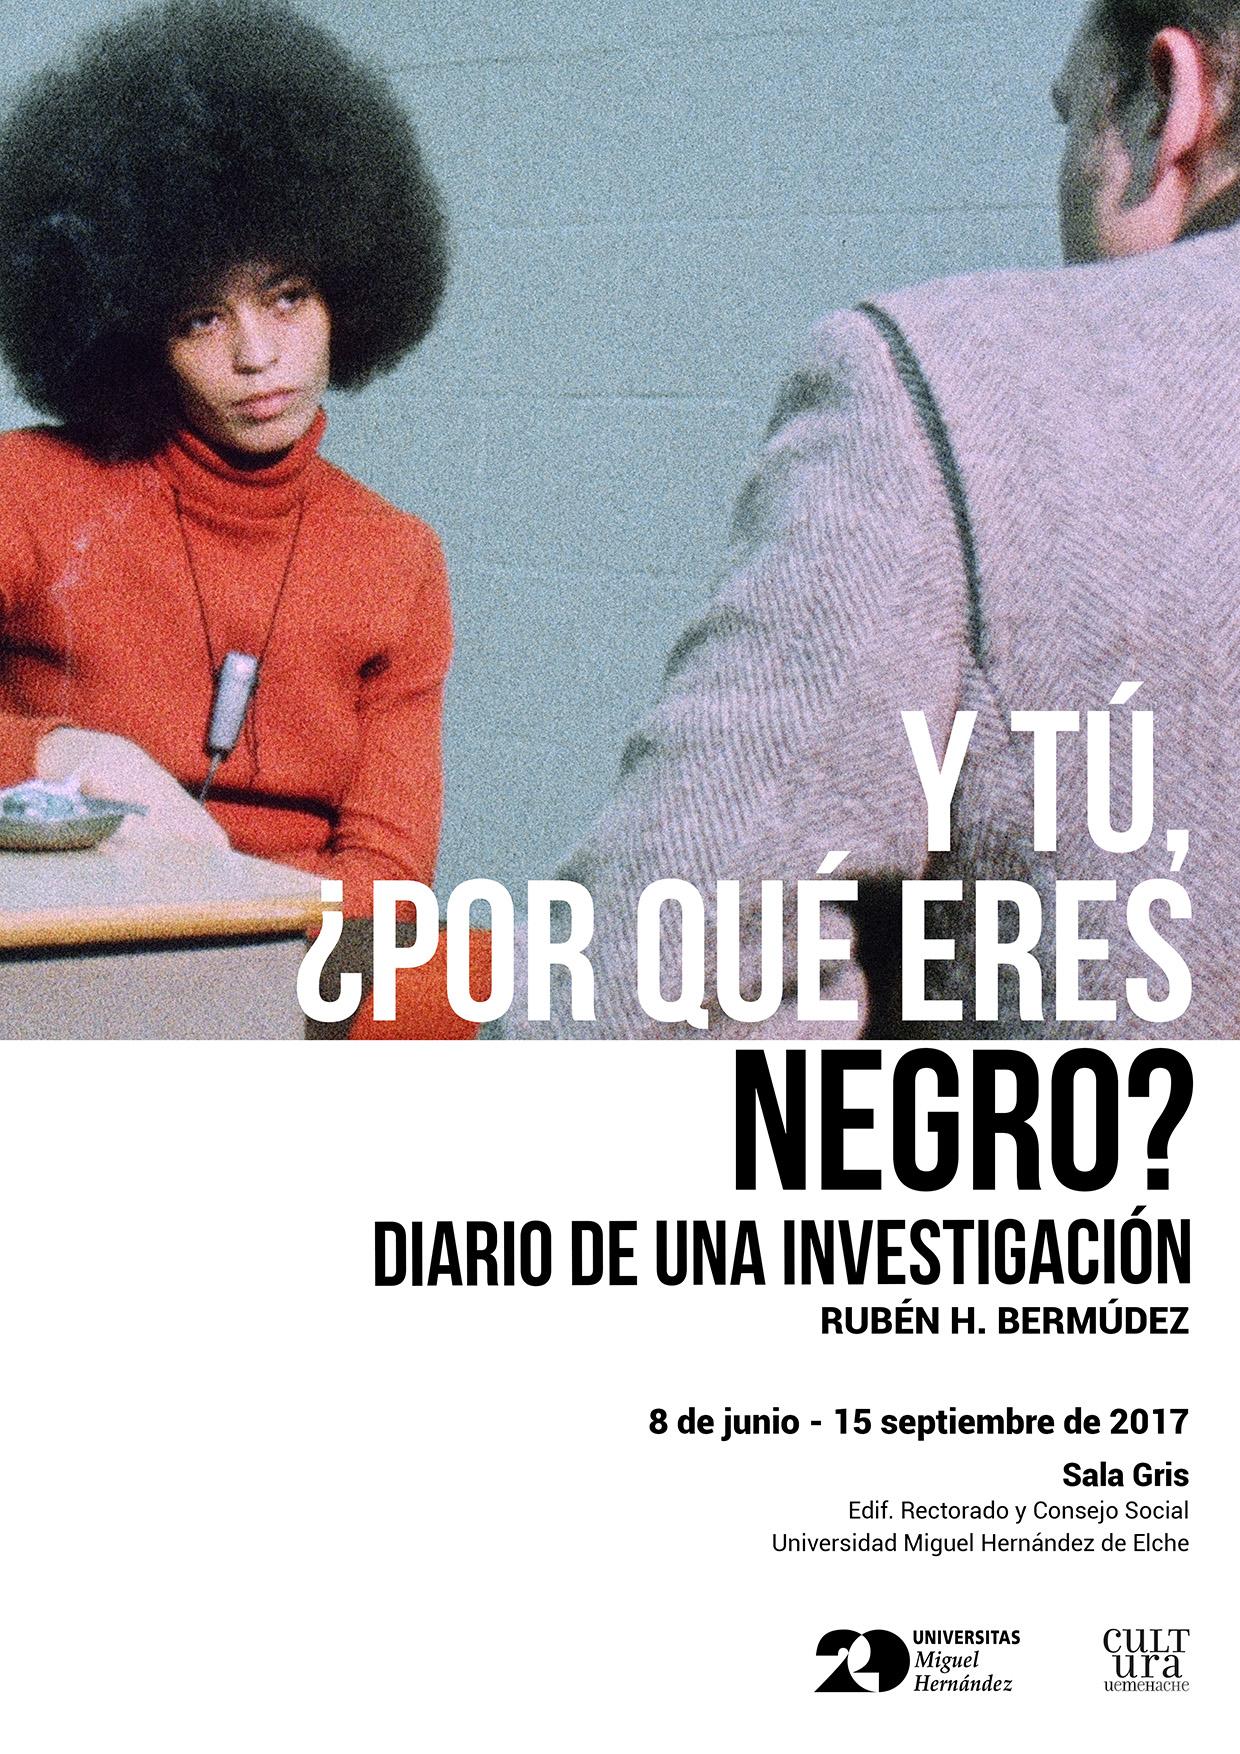 Cartel_YTuPorQueEresNegro(web)